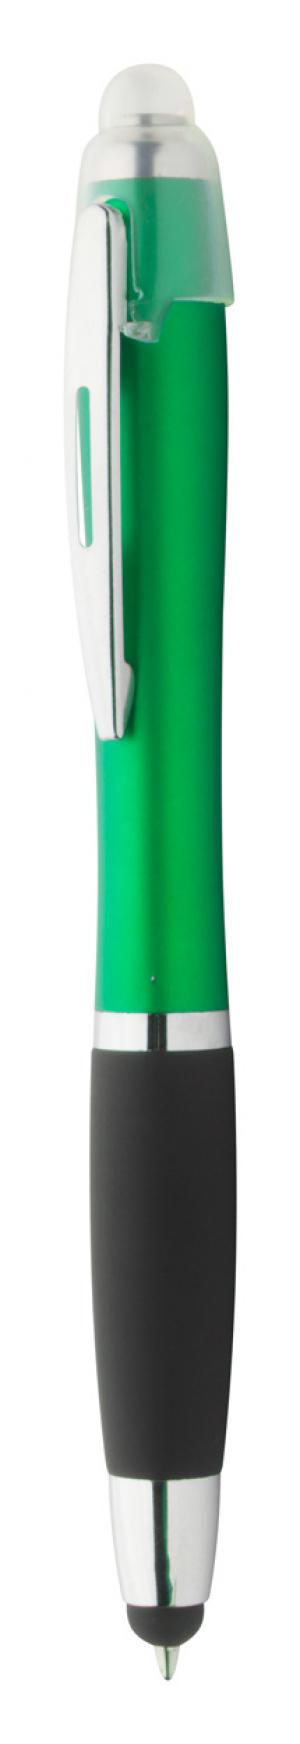 Verslo dovanos Ladox (touch ballpoint pen)